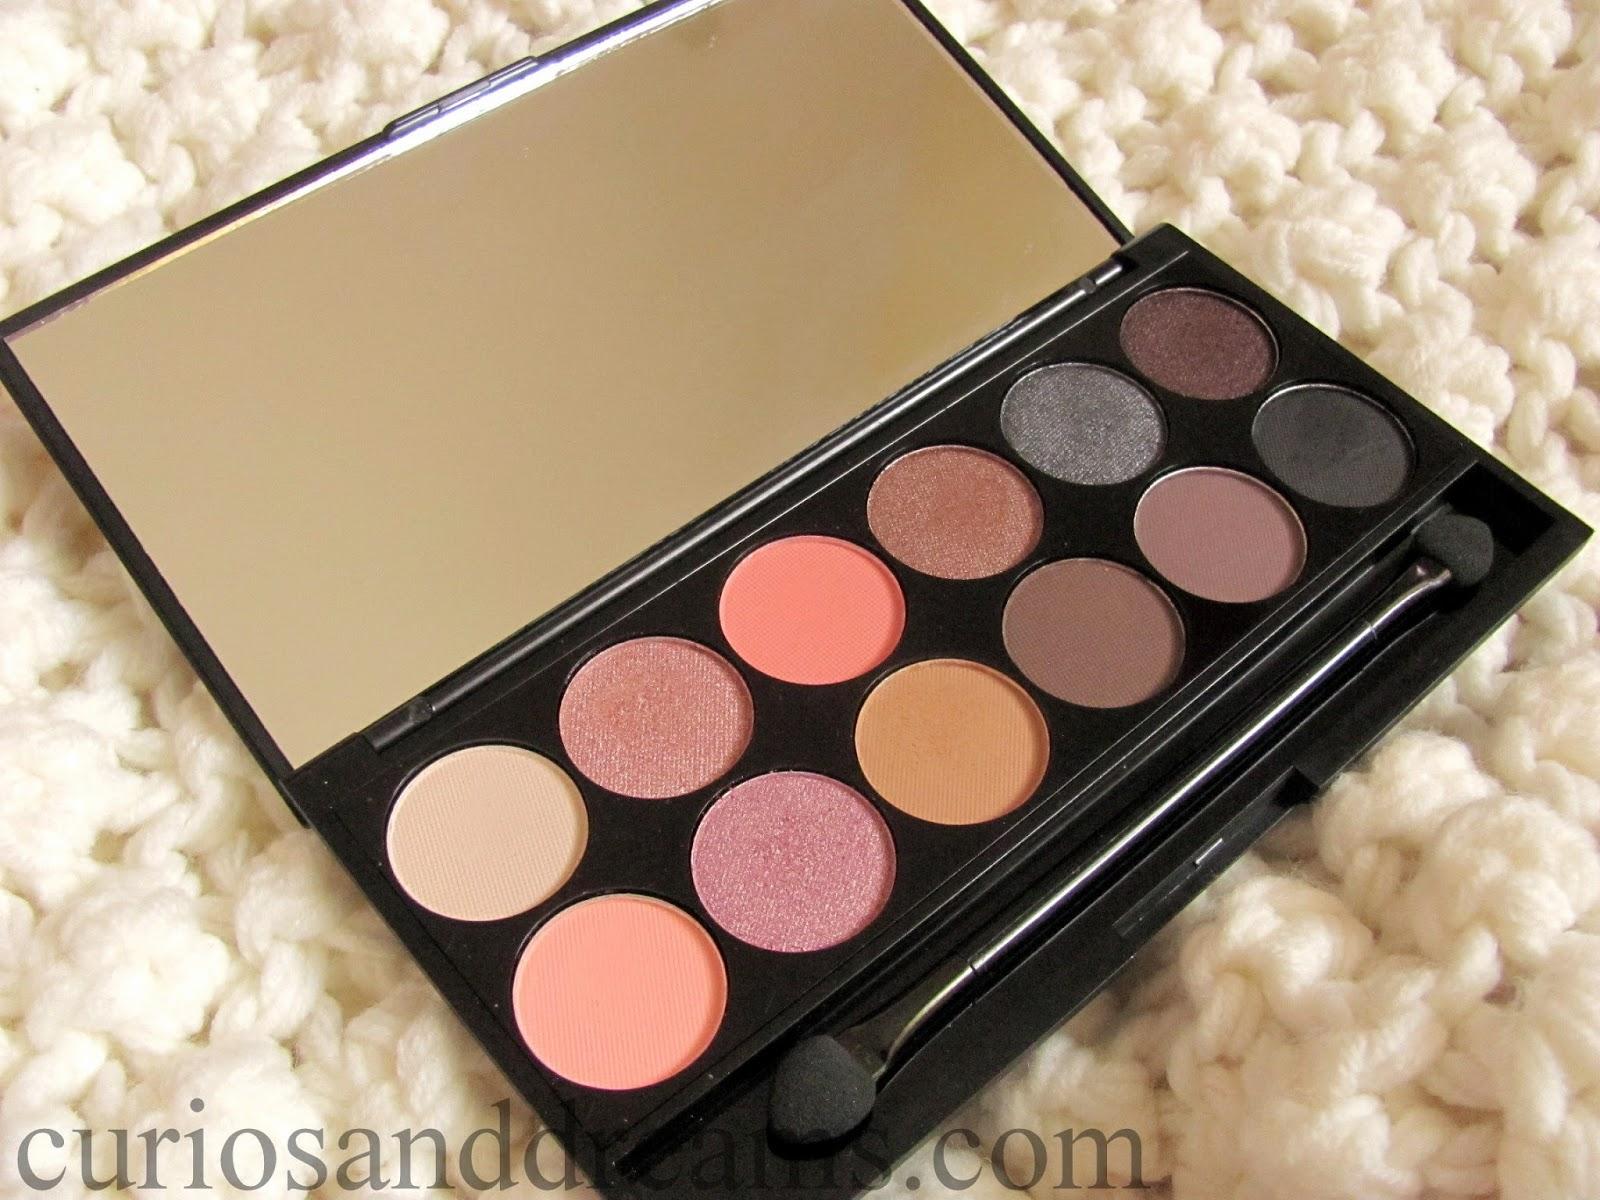 Sleek Oh So Special Eyeshadow Palette review